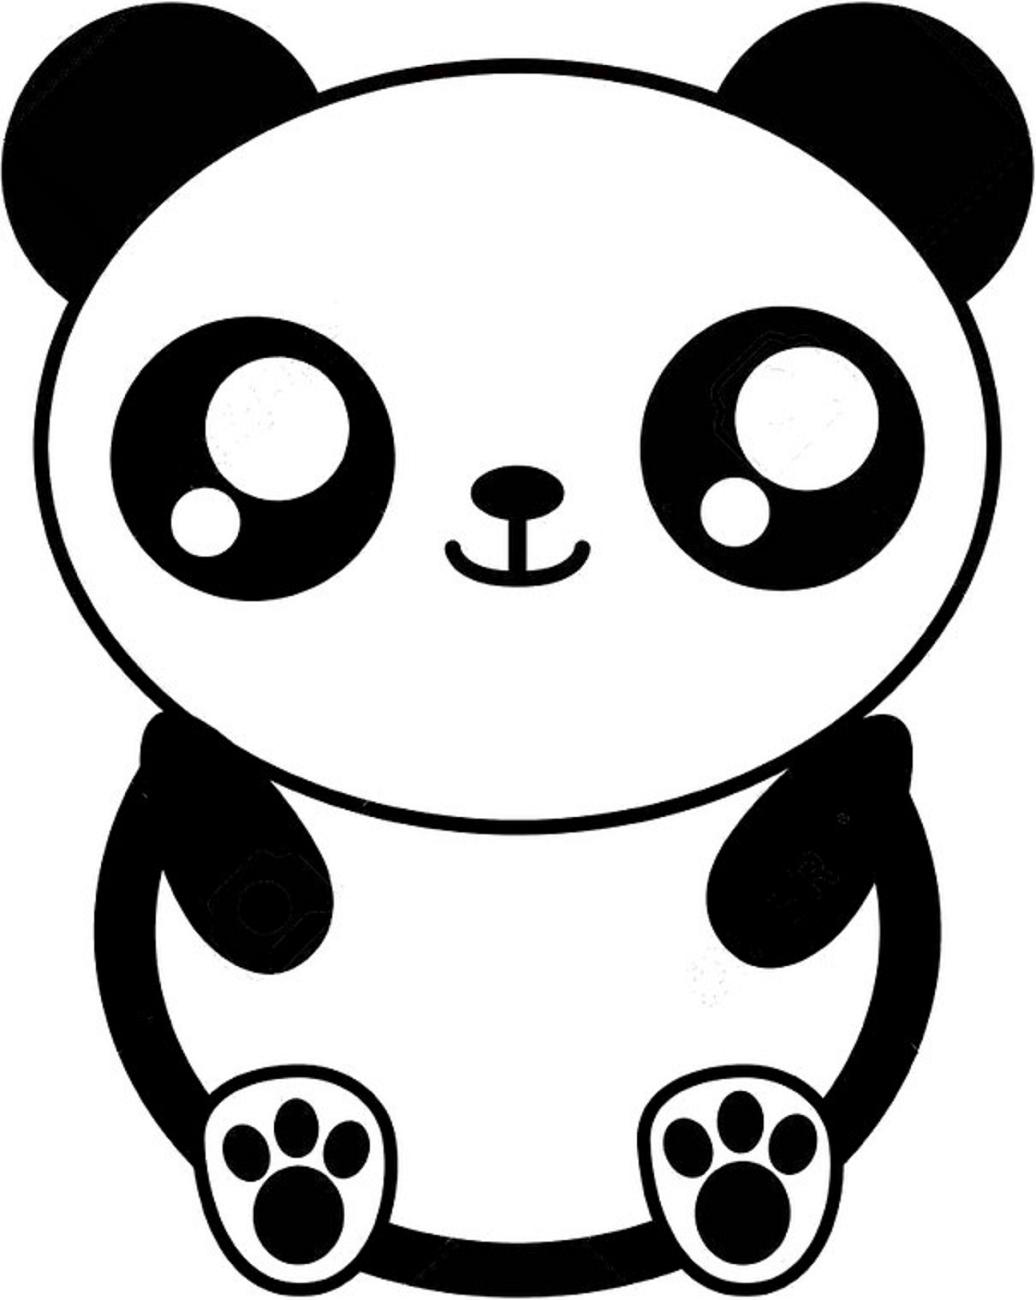 25 Dibujos Para Colorear Kawaii Panda Colorearimagenesnet